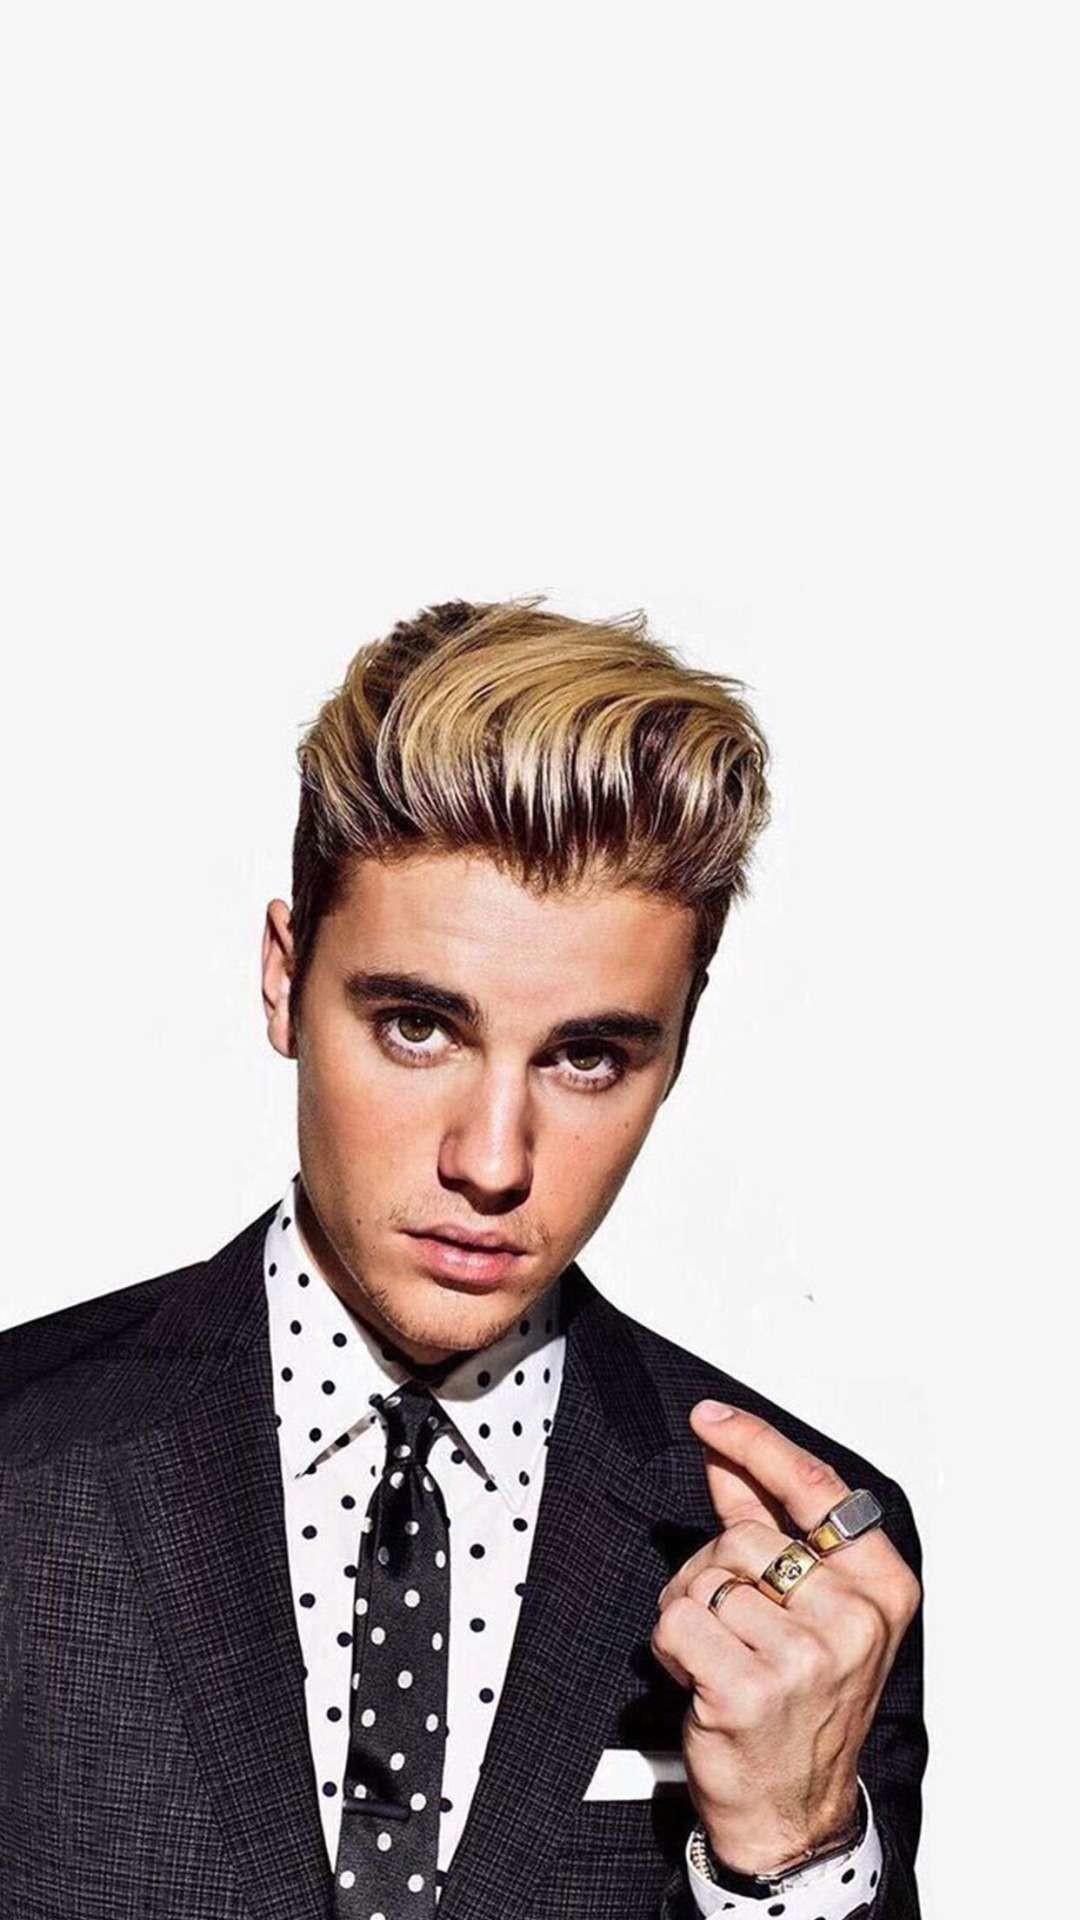 Justin Bieber 2018 Wallpaper 80 Pictures